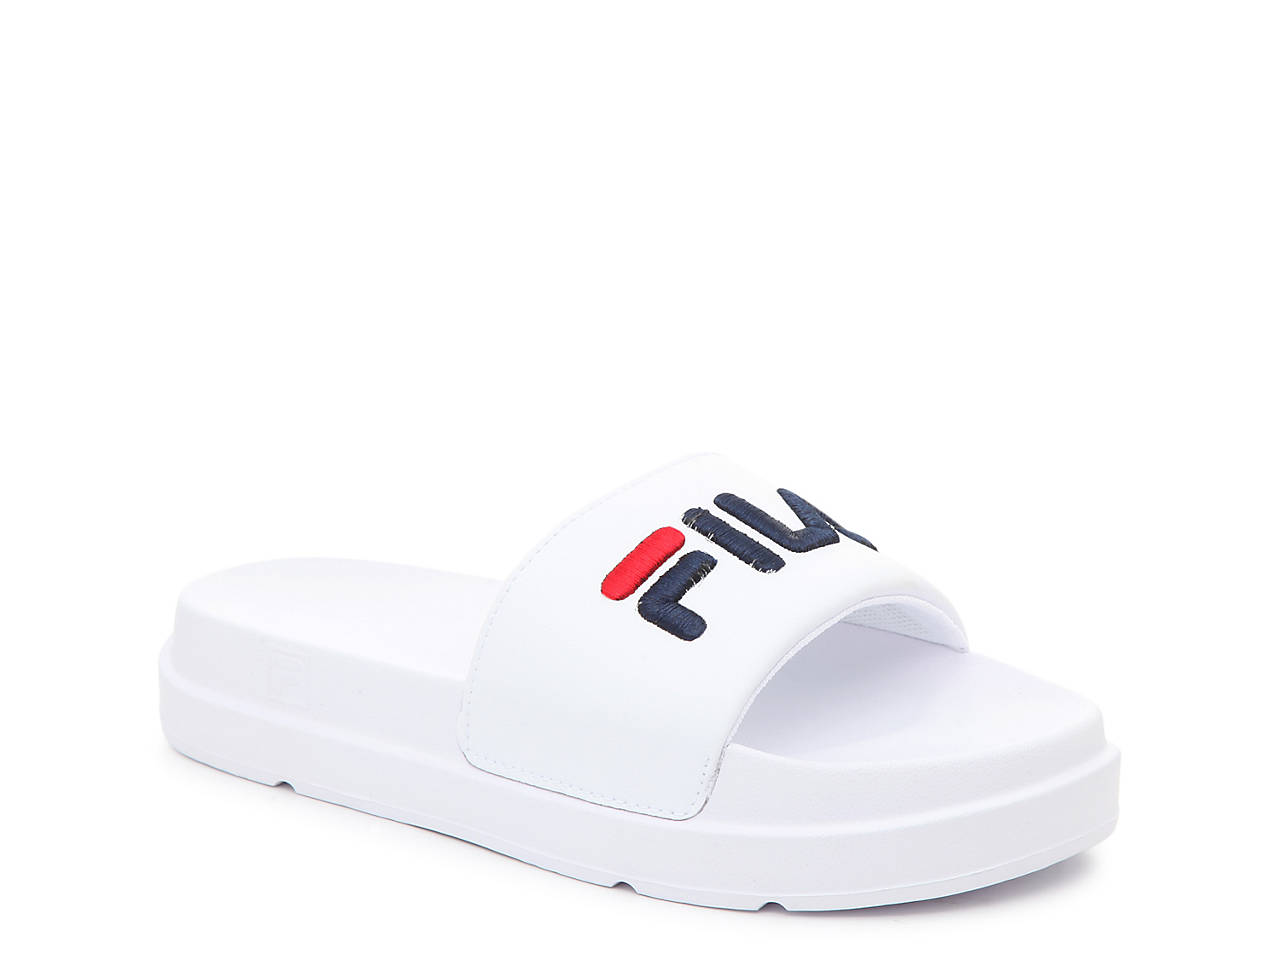 37e30a2f8627 Fila Drifter Bold Slide Sandal - Women s Women s Shoes